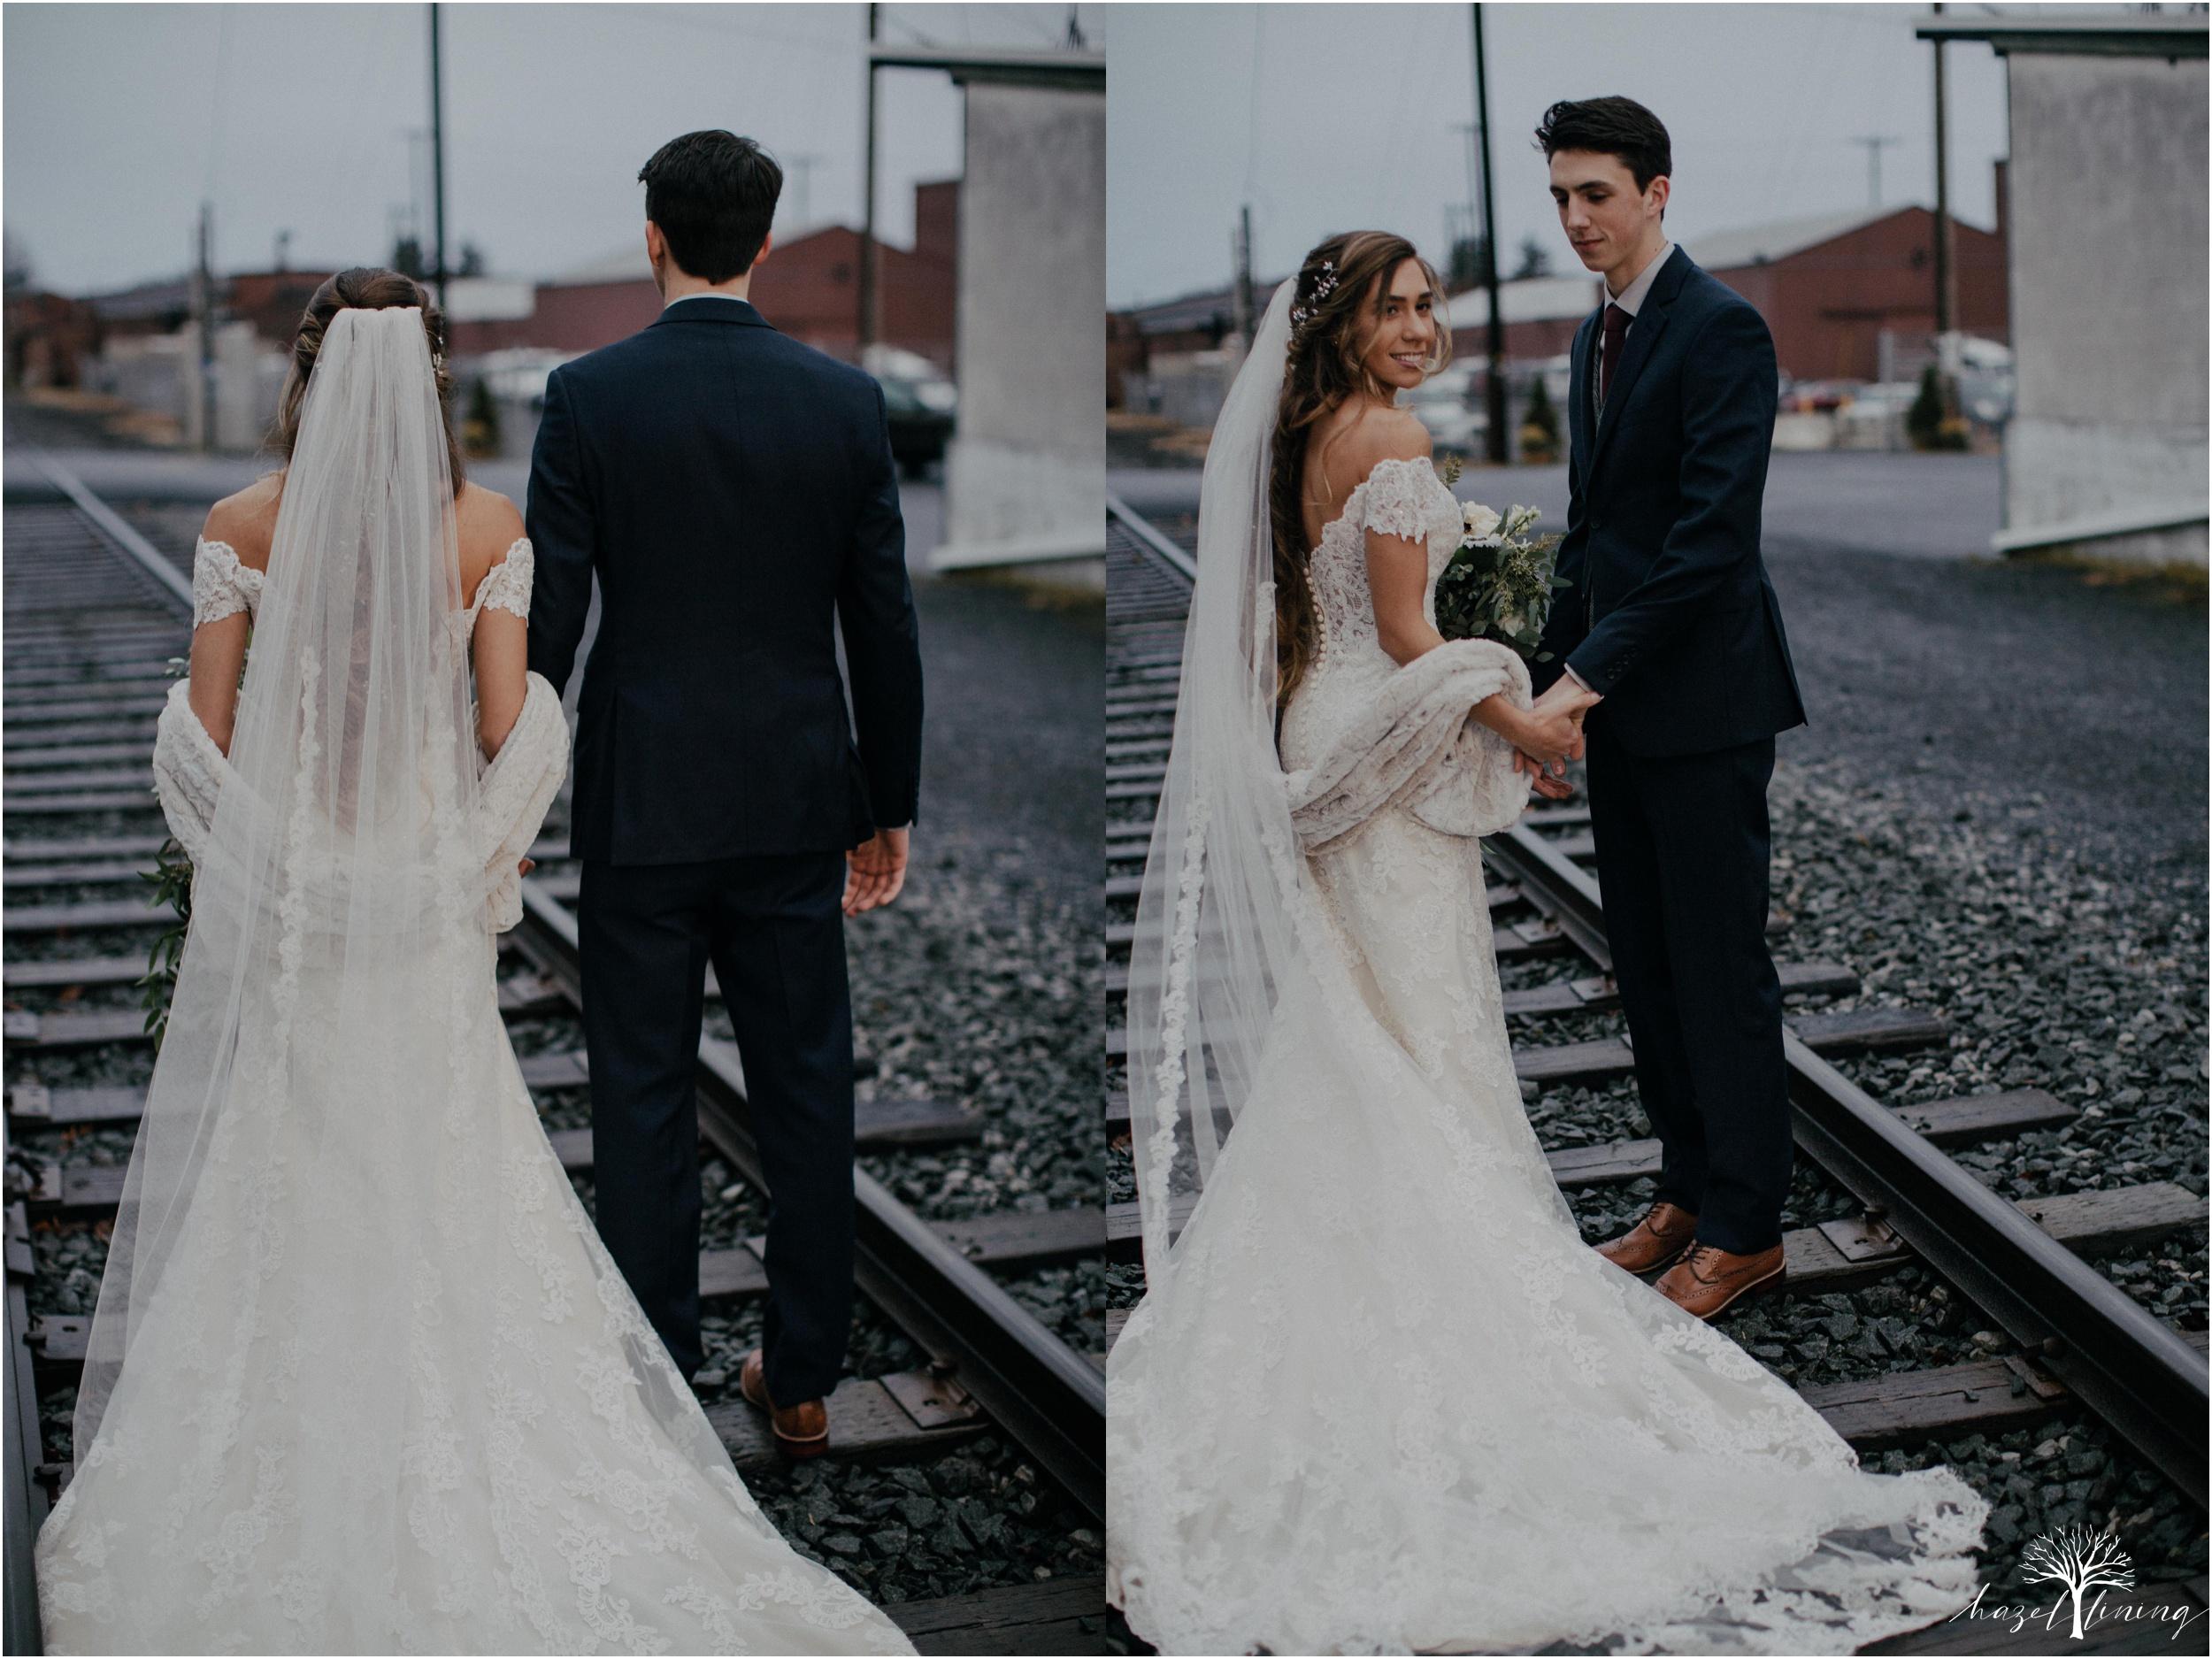 emma-matt-gehringer-the-booking-house-lancaster-manhiem-pennsylvania-winter-wedding_0104.jpg